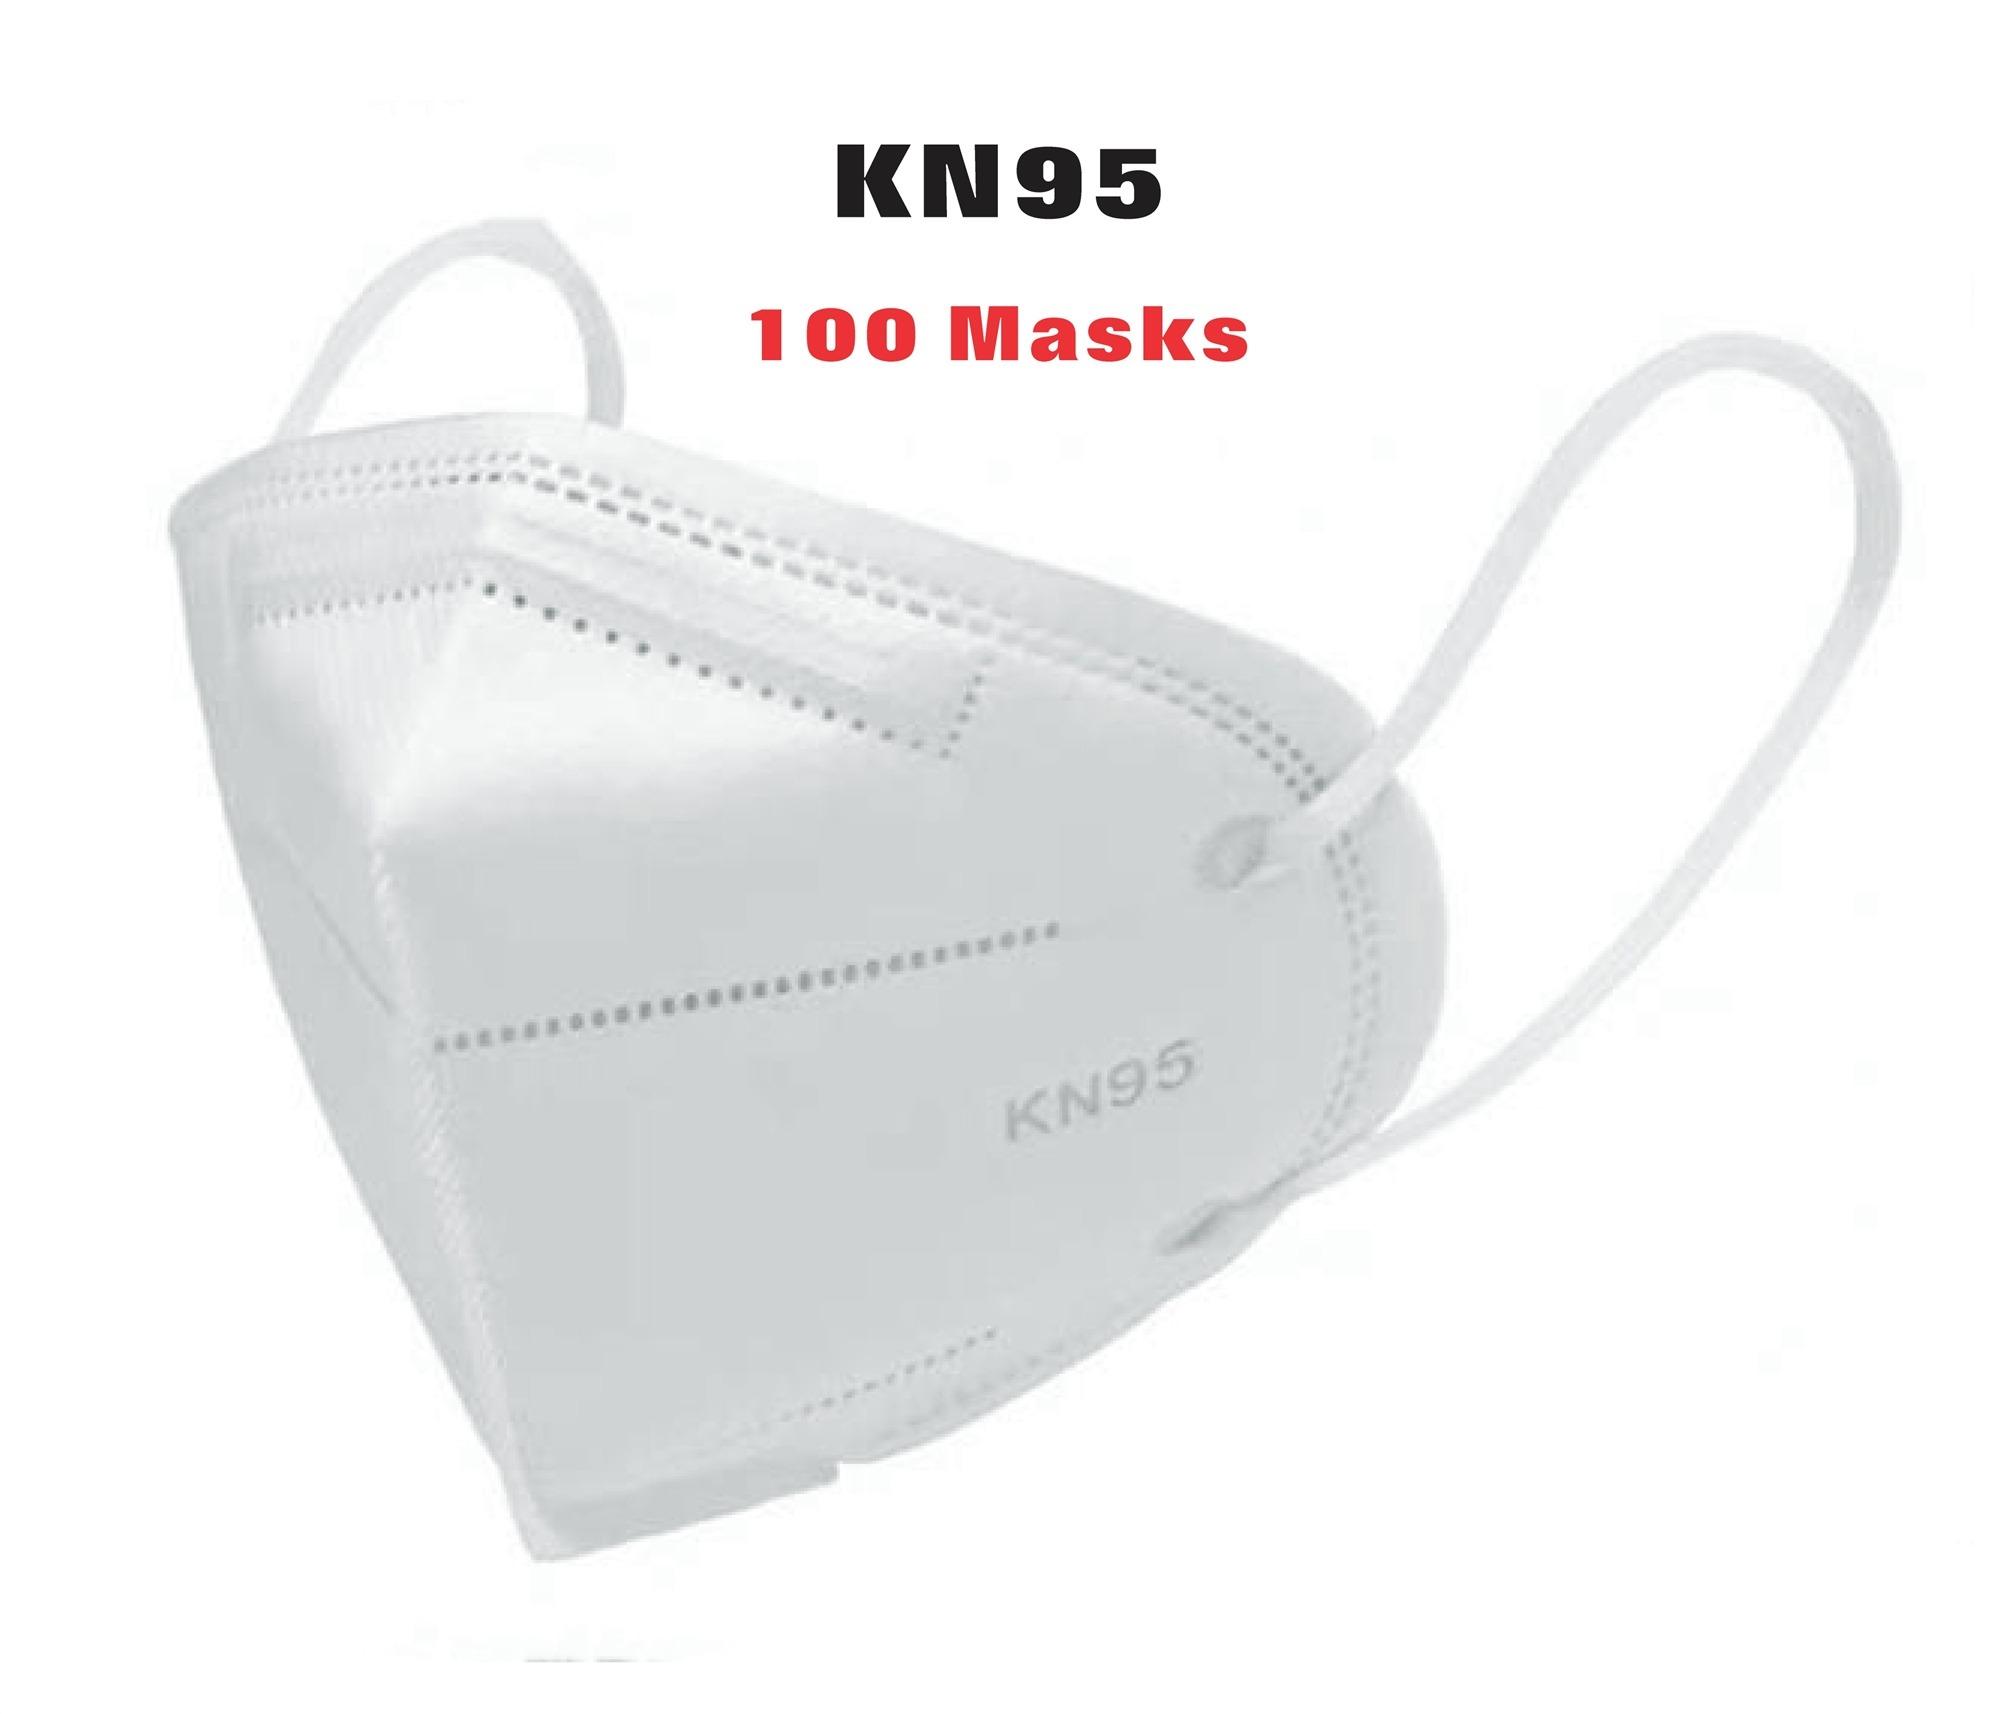 CanGard Care - KN95 100 Masks